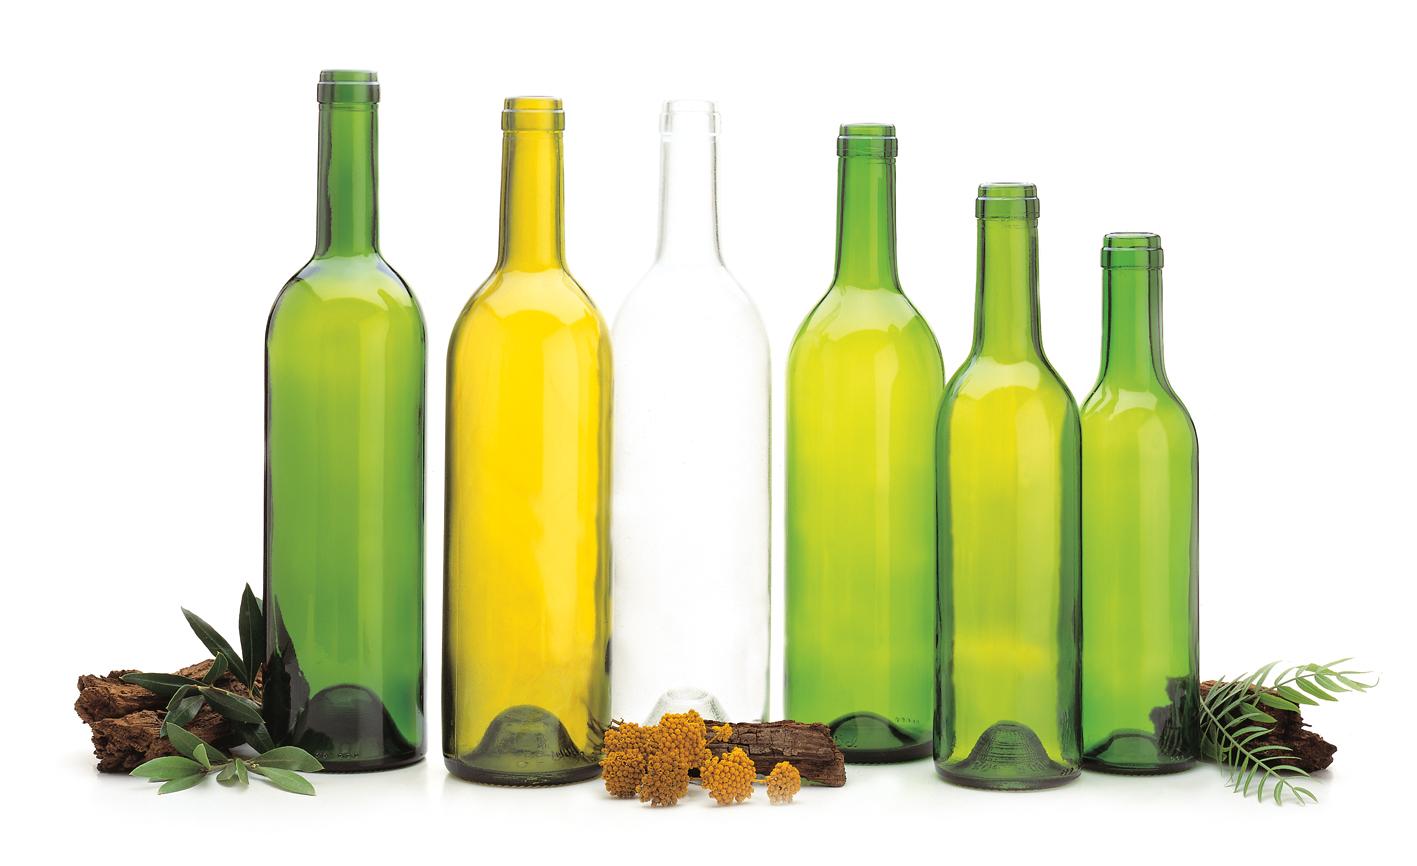 Envases De Vidrio Cool Envases De Vidrio With Envases De